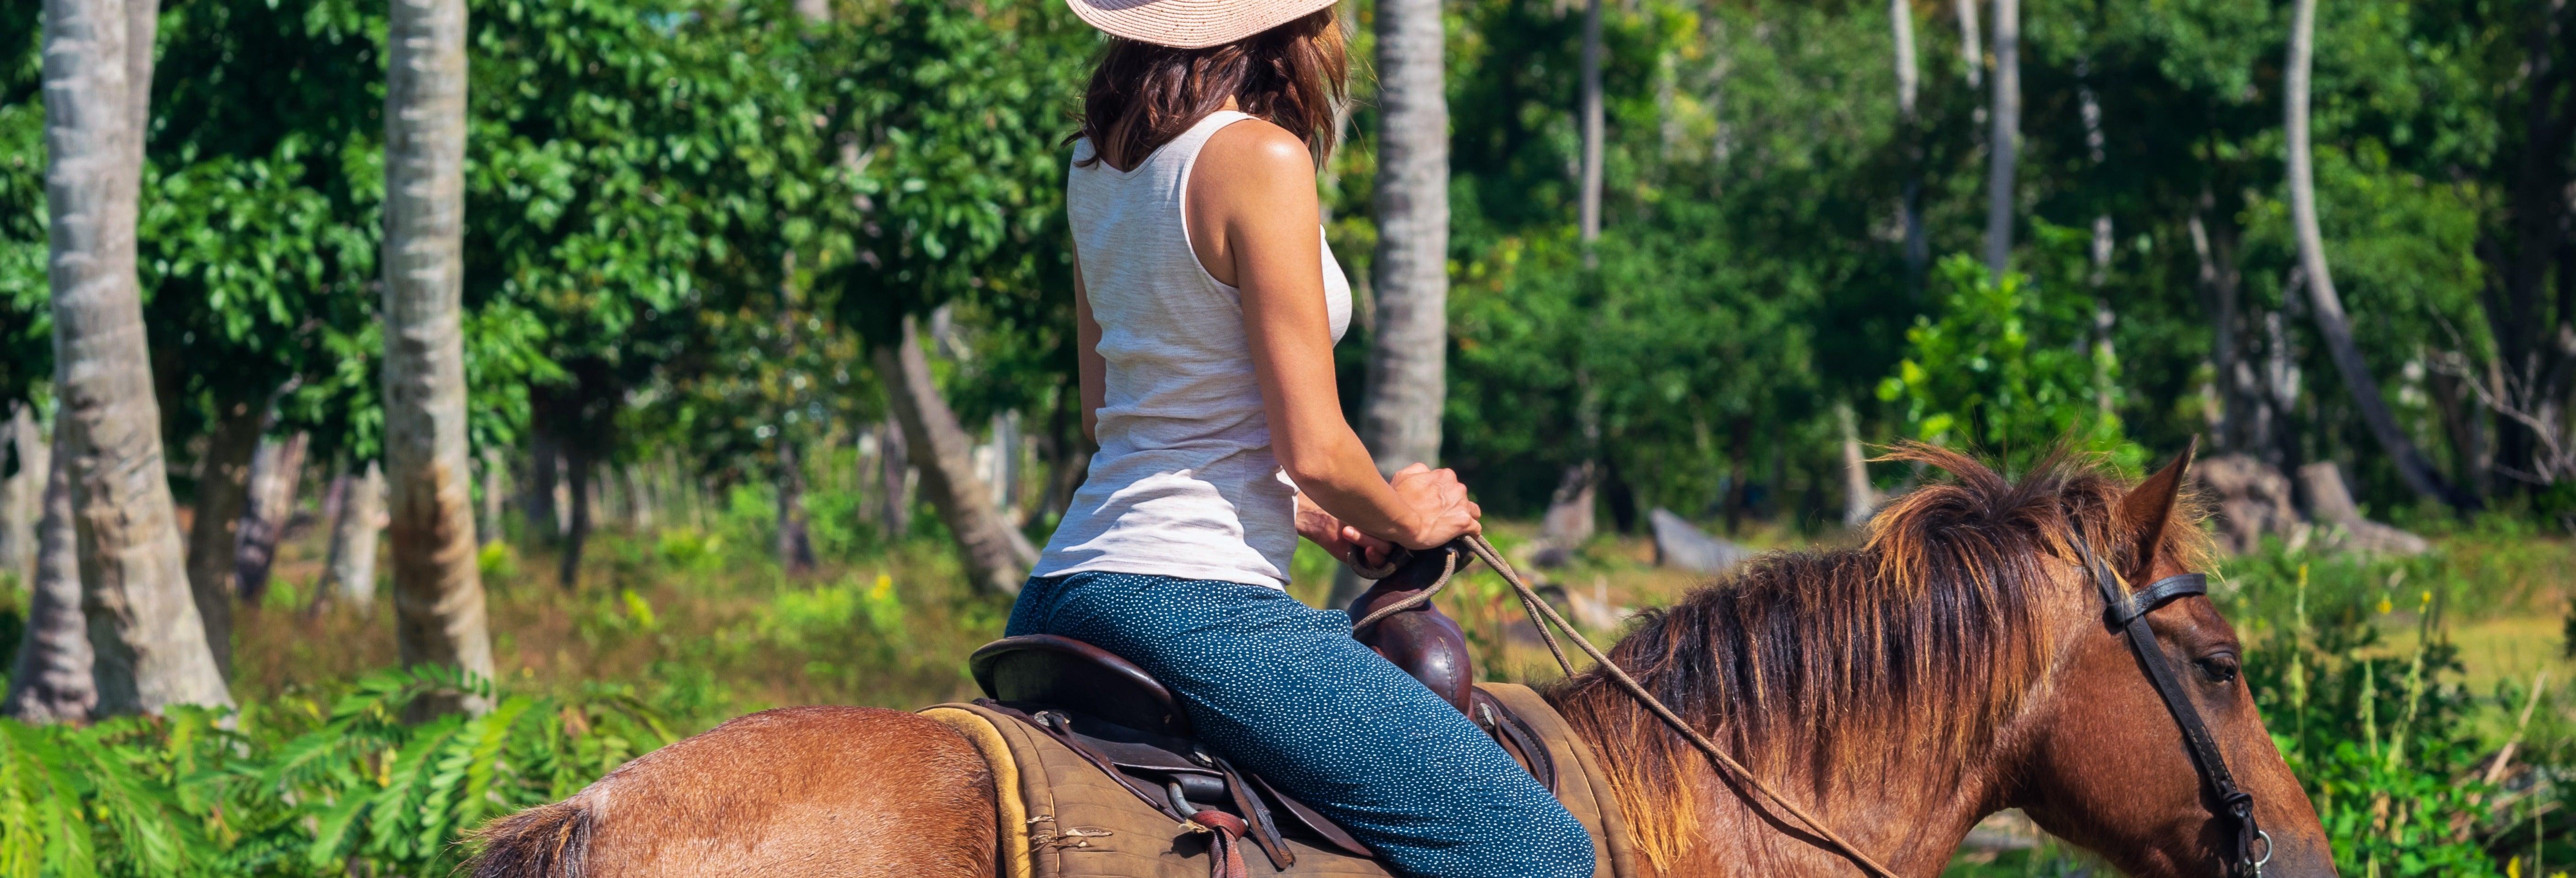 Passeio a cavalo pela praia Arriba e Punta Hicaco